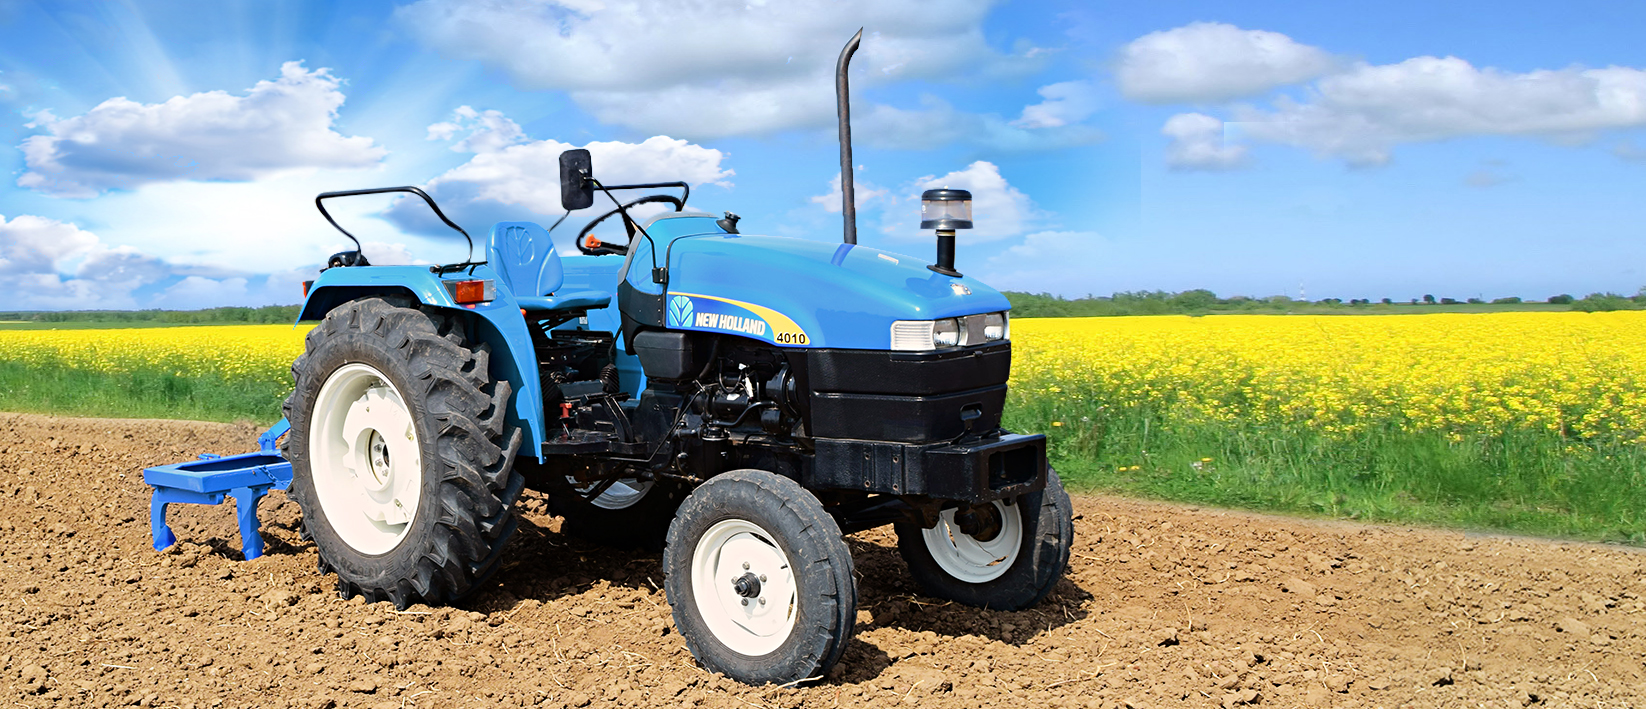 Agriculture Tractors Market Explosive Factors of Revenue by Key Vendors Size, Demand, Development Strategy, Future Trends